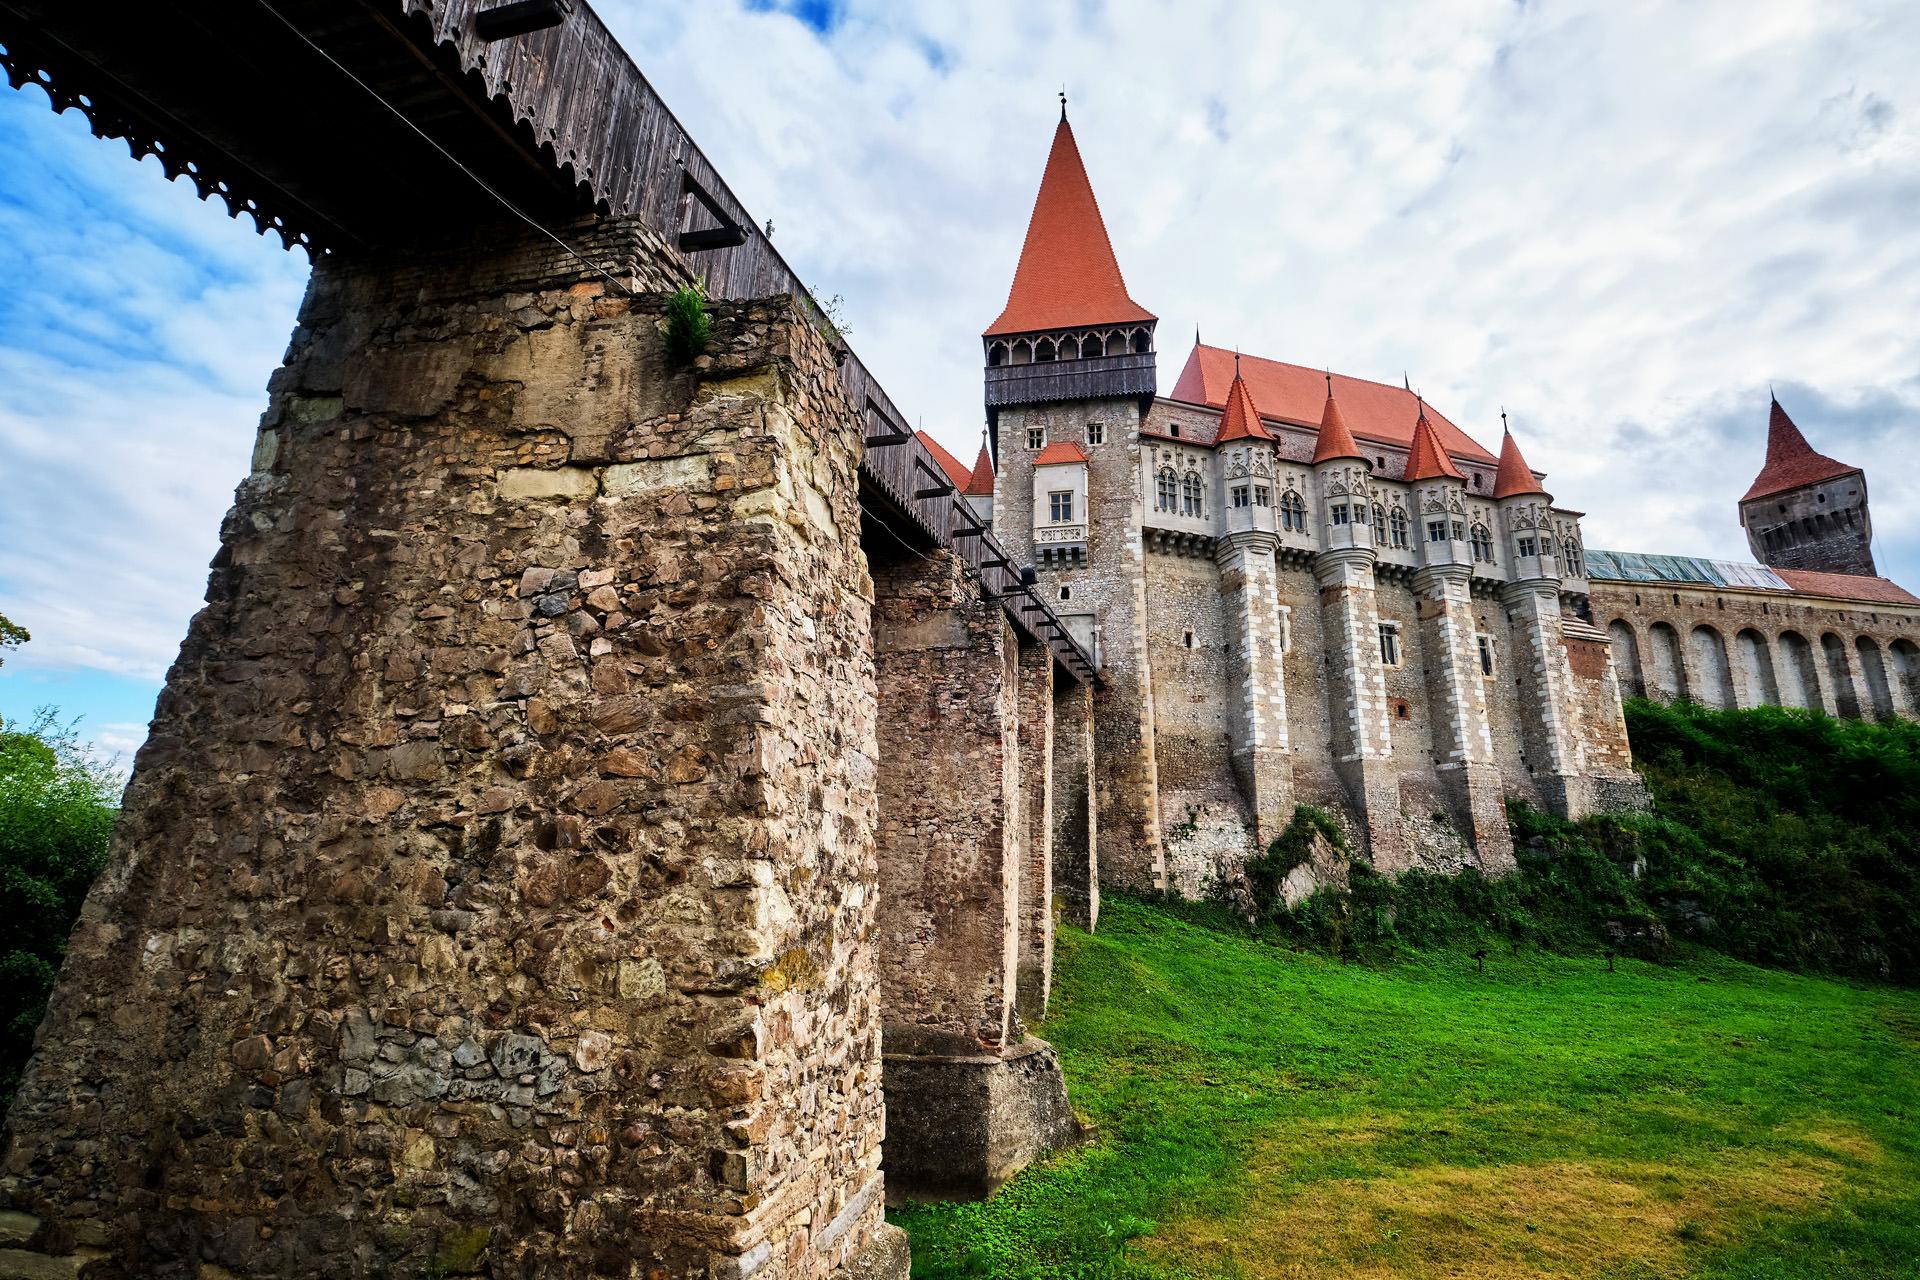 Corvins Castle in Romania